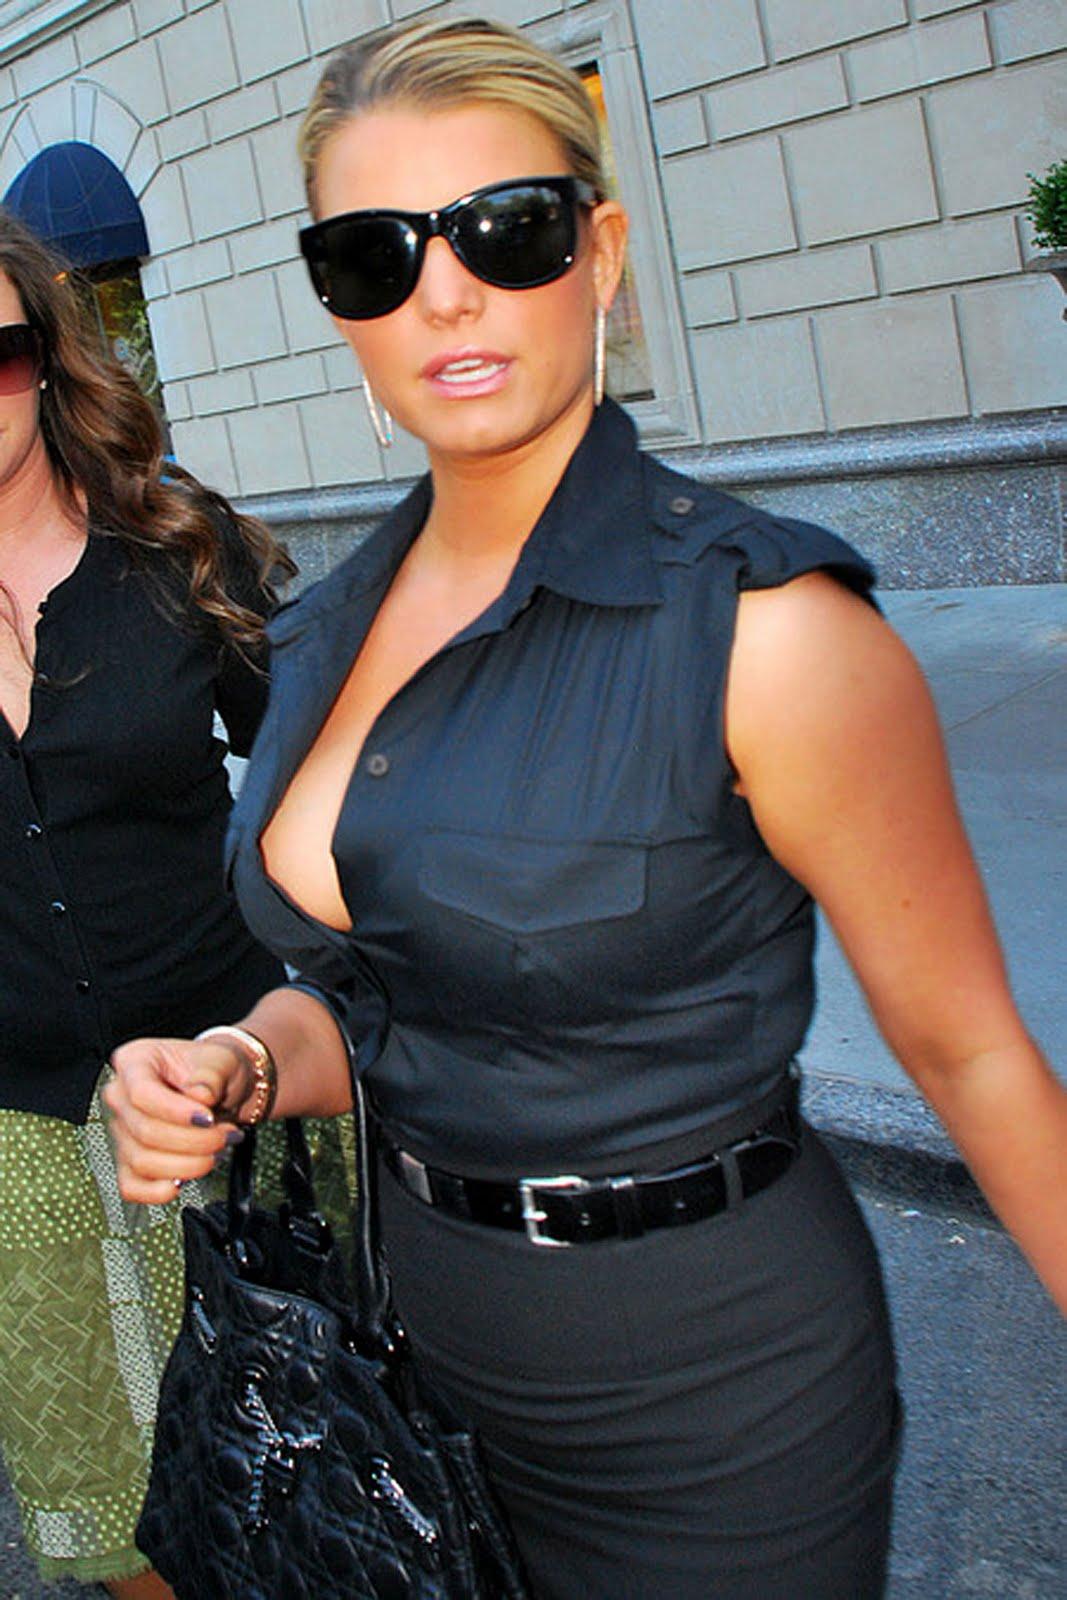 http://1.bp.blogspot.com/_3jGuIxnGX-M/TFqQKOCsntI/AAAAAAAAAhg/aNwlQuXh5c0/s1600/jessica-simpson-boobs.jpg